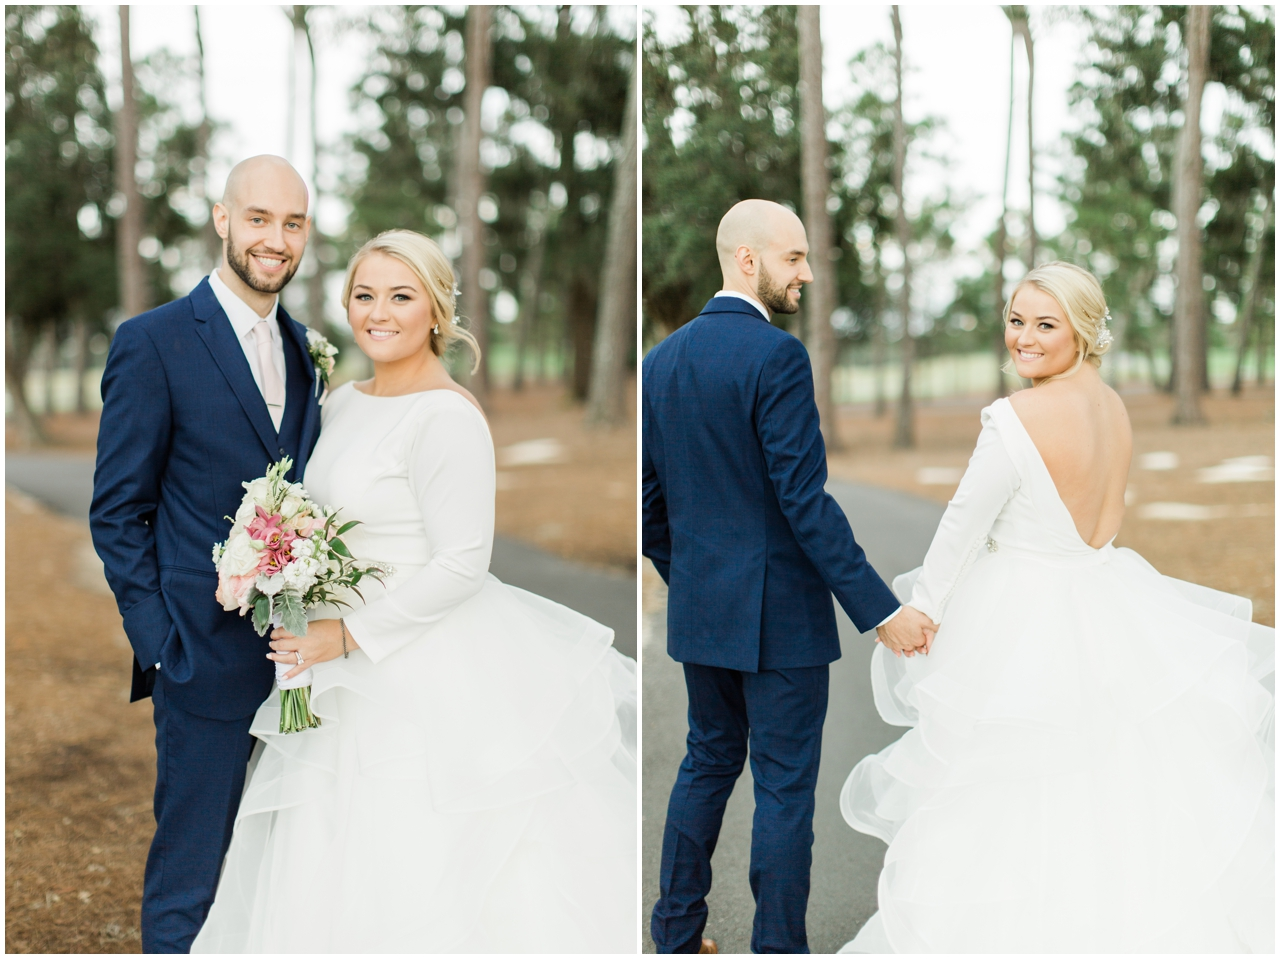 Jacksonville-Wedding-photographers-brooke-images-TPC-Sawgrass-Wedding-Mary-Kevin-blog_0035.jpg